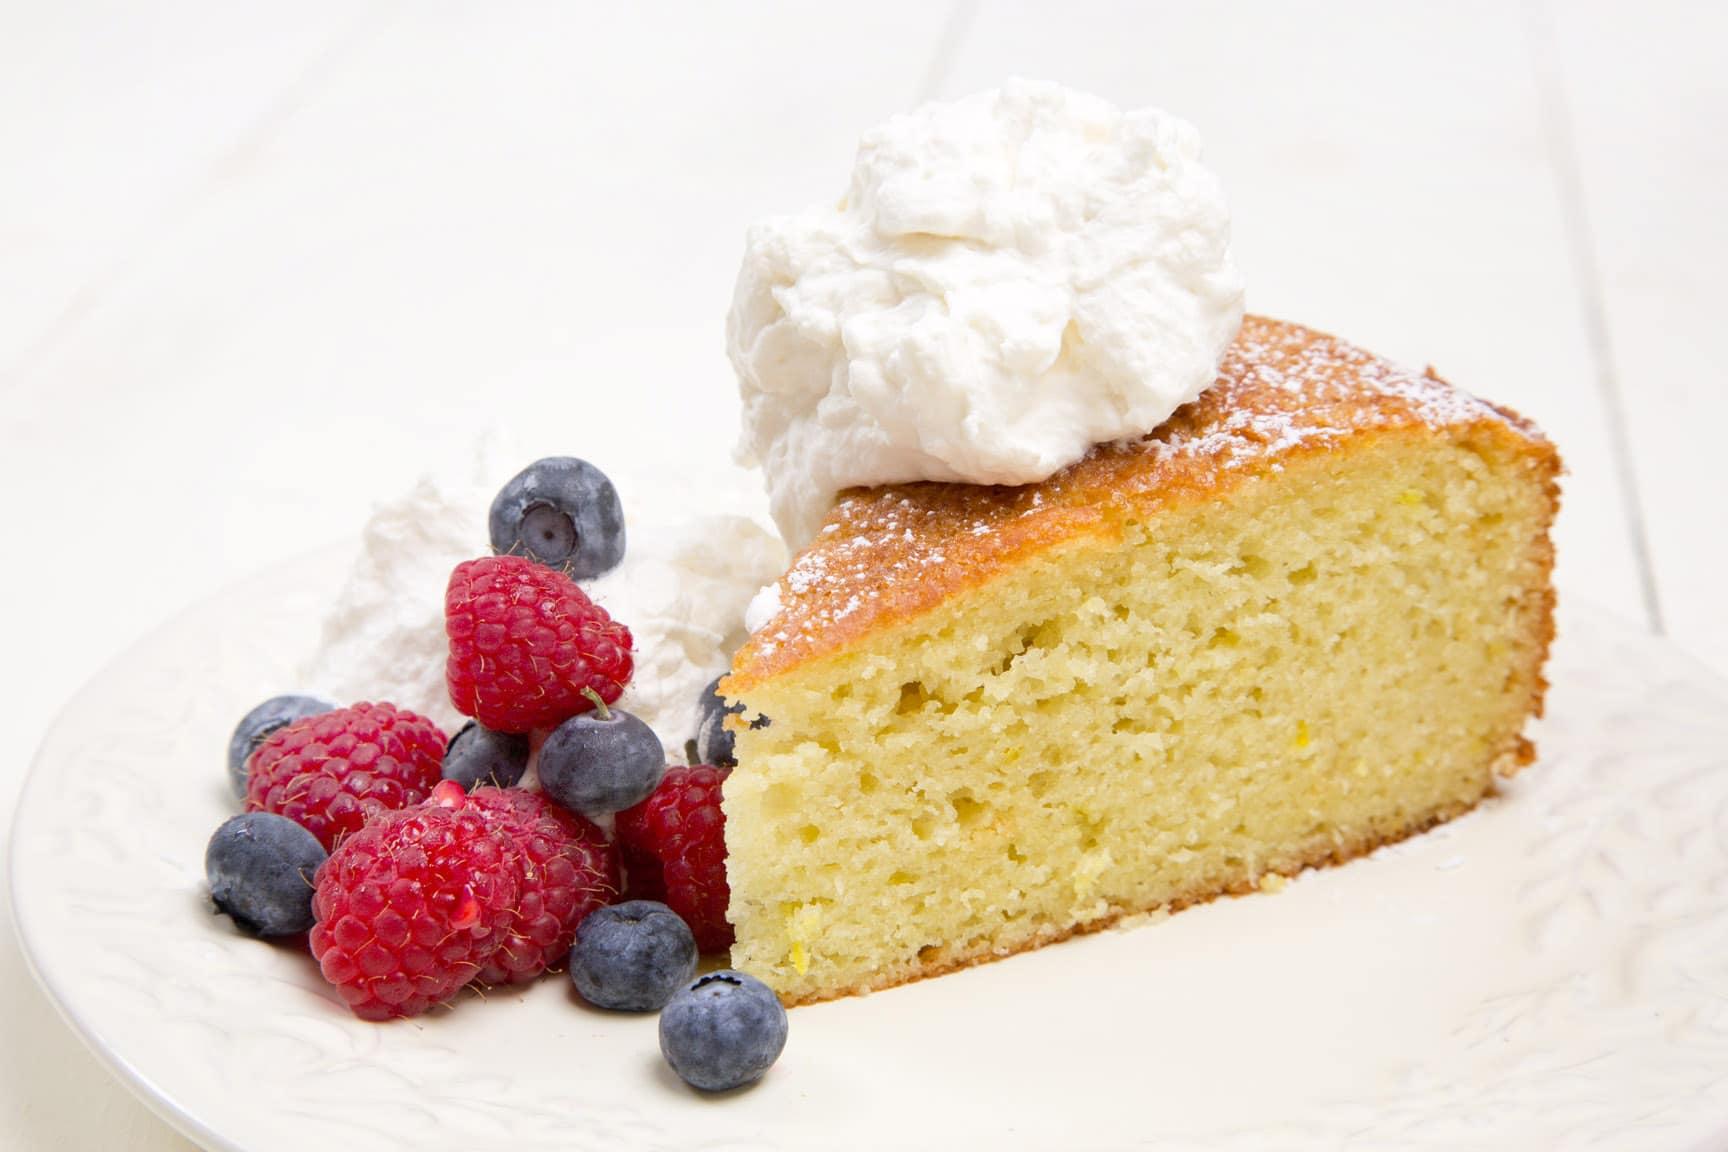 Low Fat Cake Recipes With Yogurt Uk: Orange Yogurt Cake Recipe Perfect For Breakfast Or Dessert